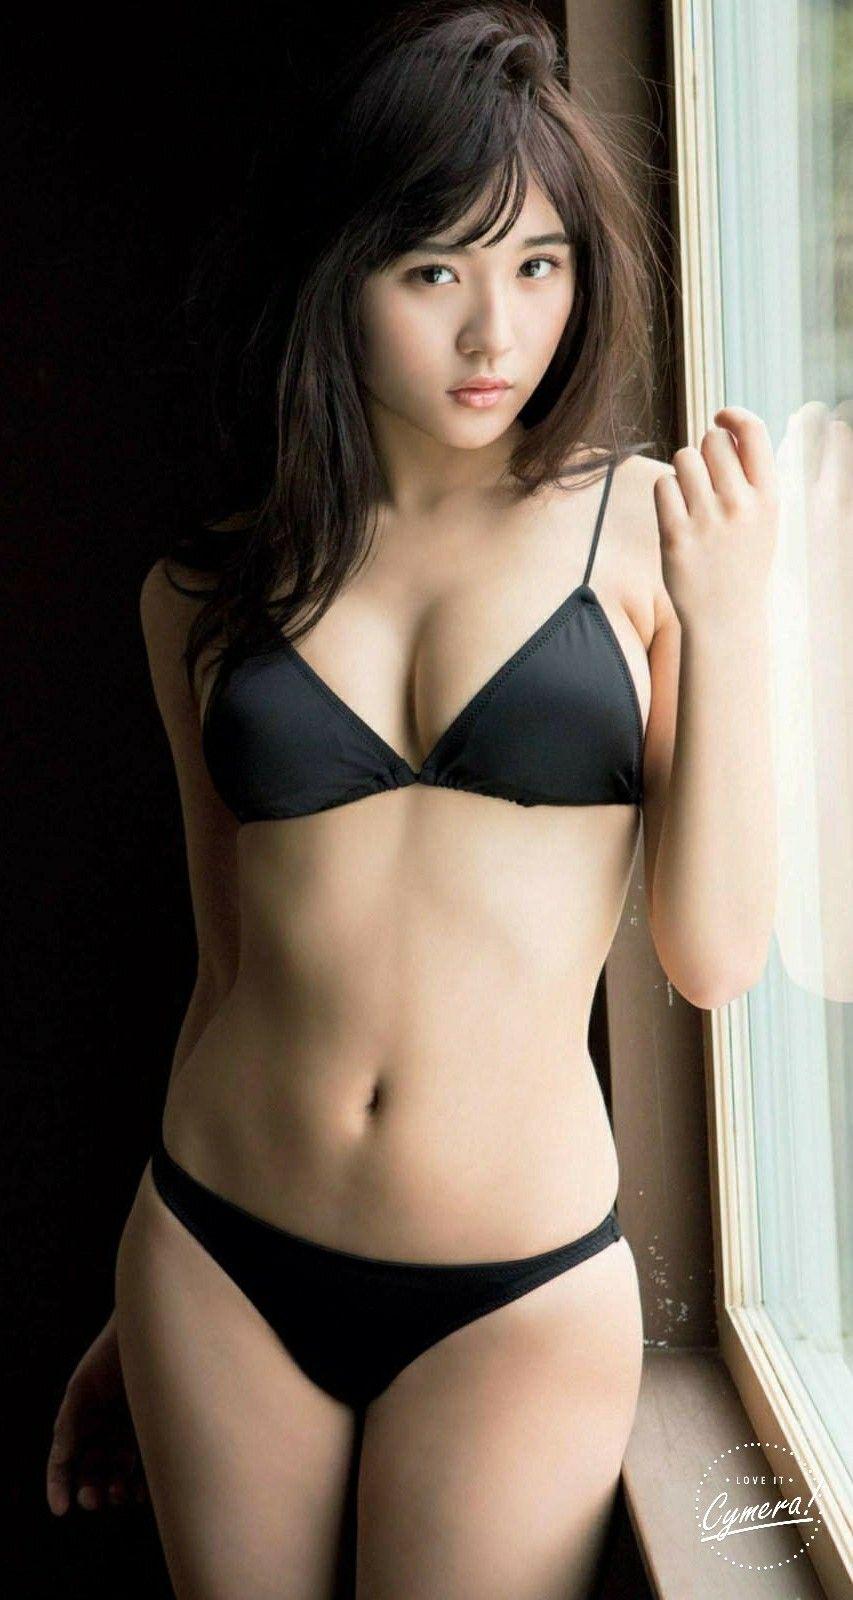 Mass effect breast